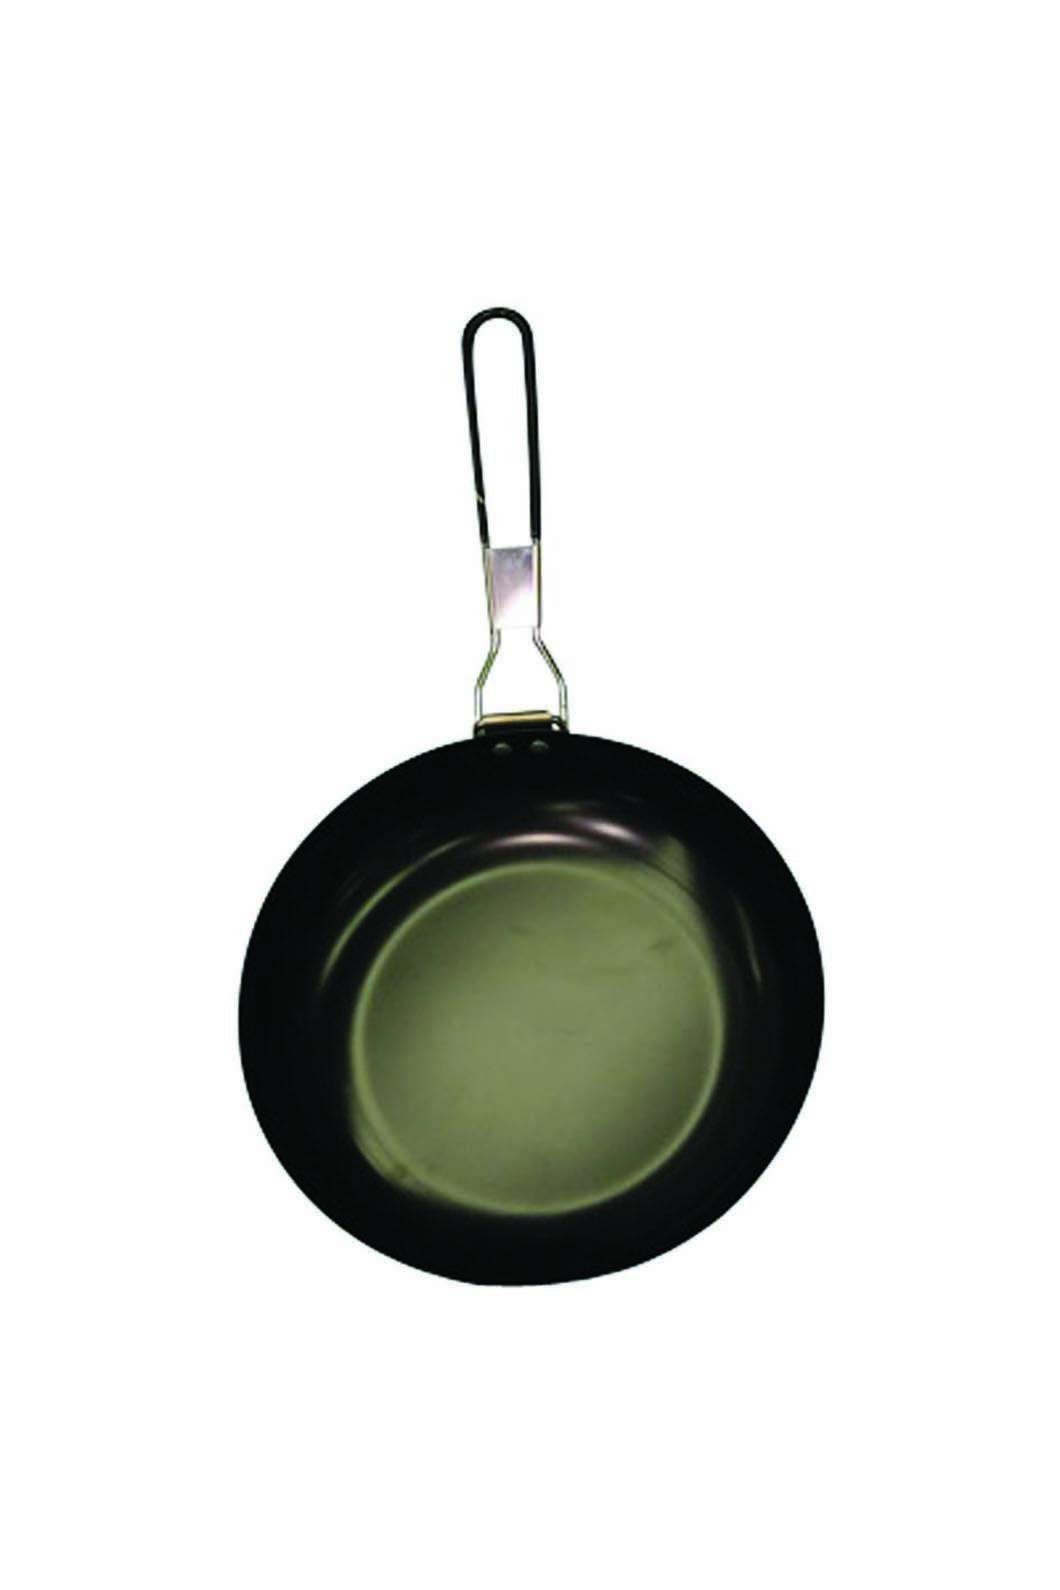 Coleman 30cm Non-Stick Fry pan, None, hi-res